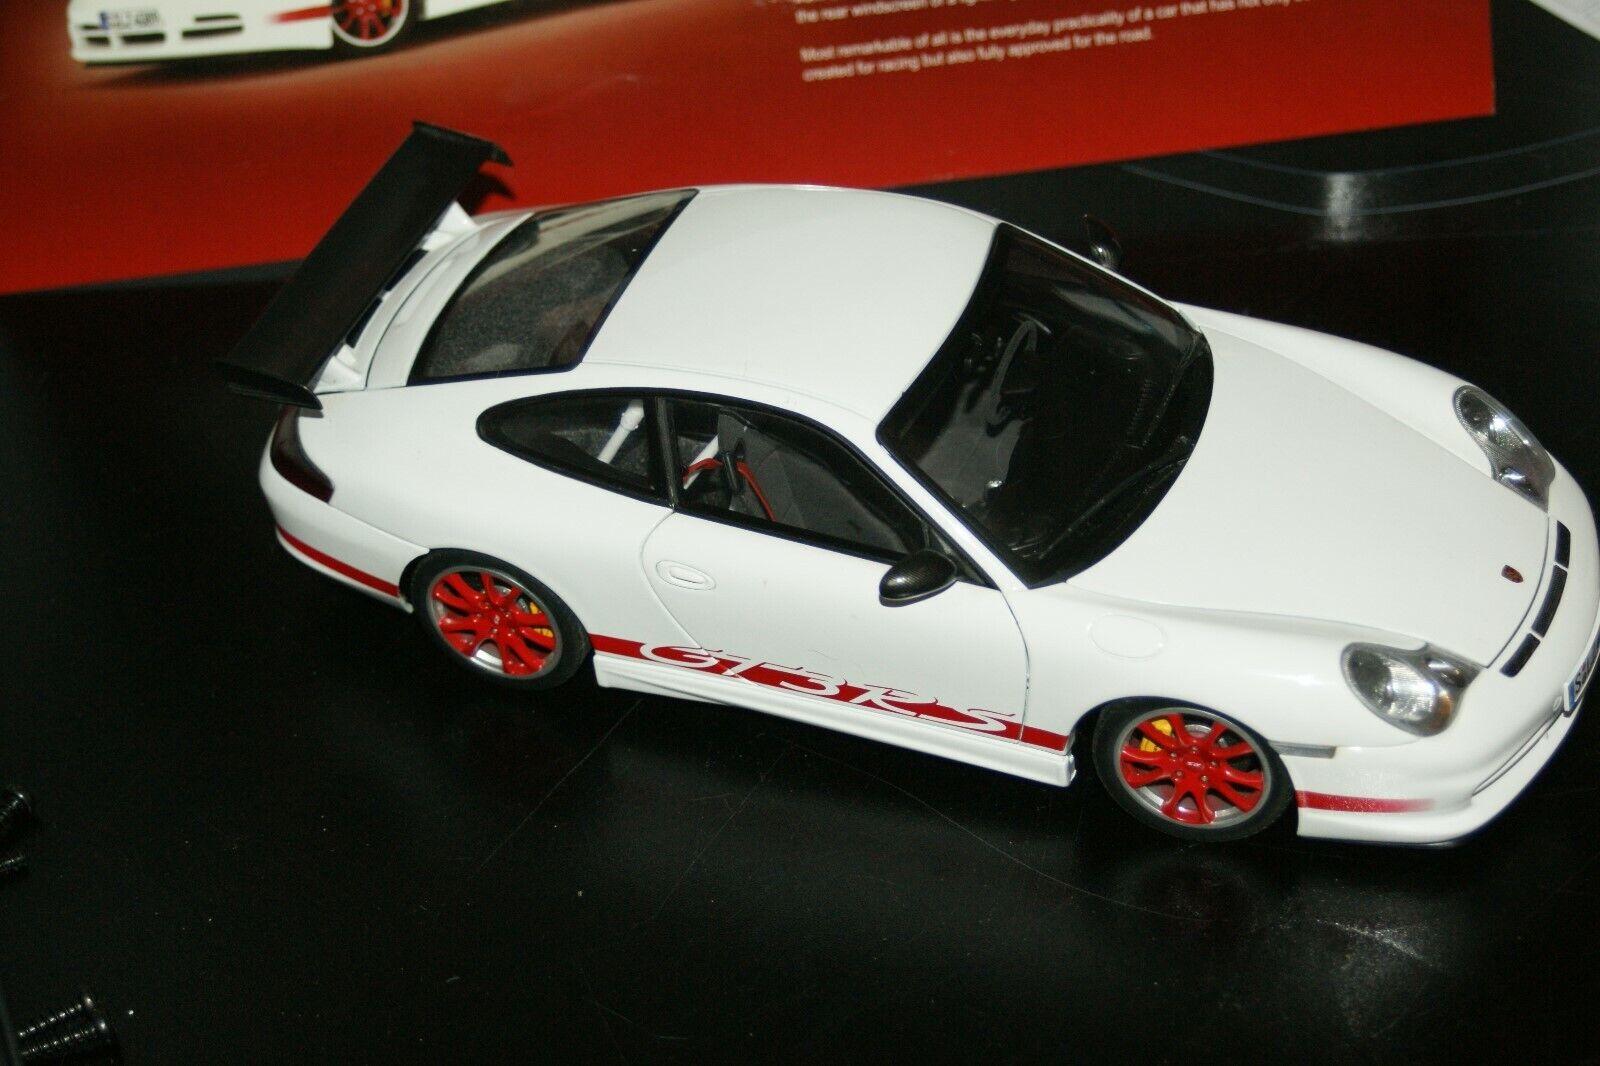 1 18 Autoart Porsche 911 997 GT3 RS blancoo   rojo stripes dealer box